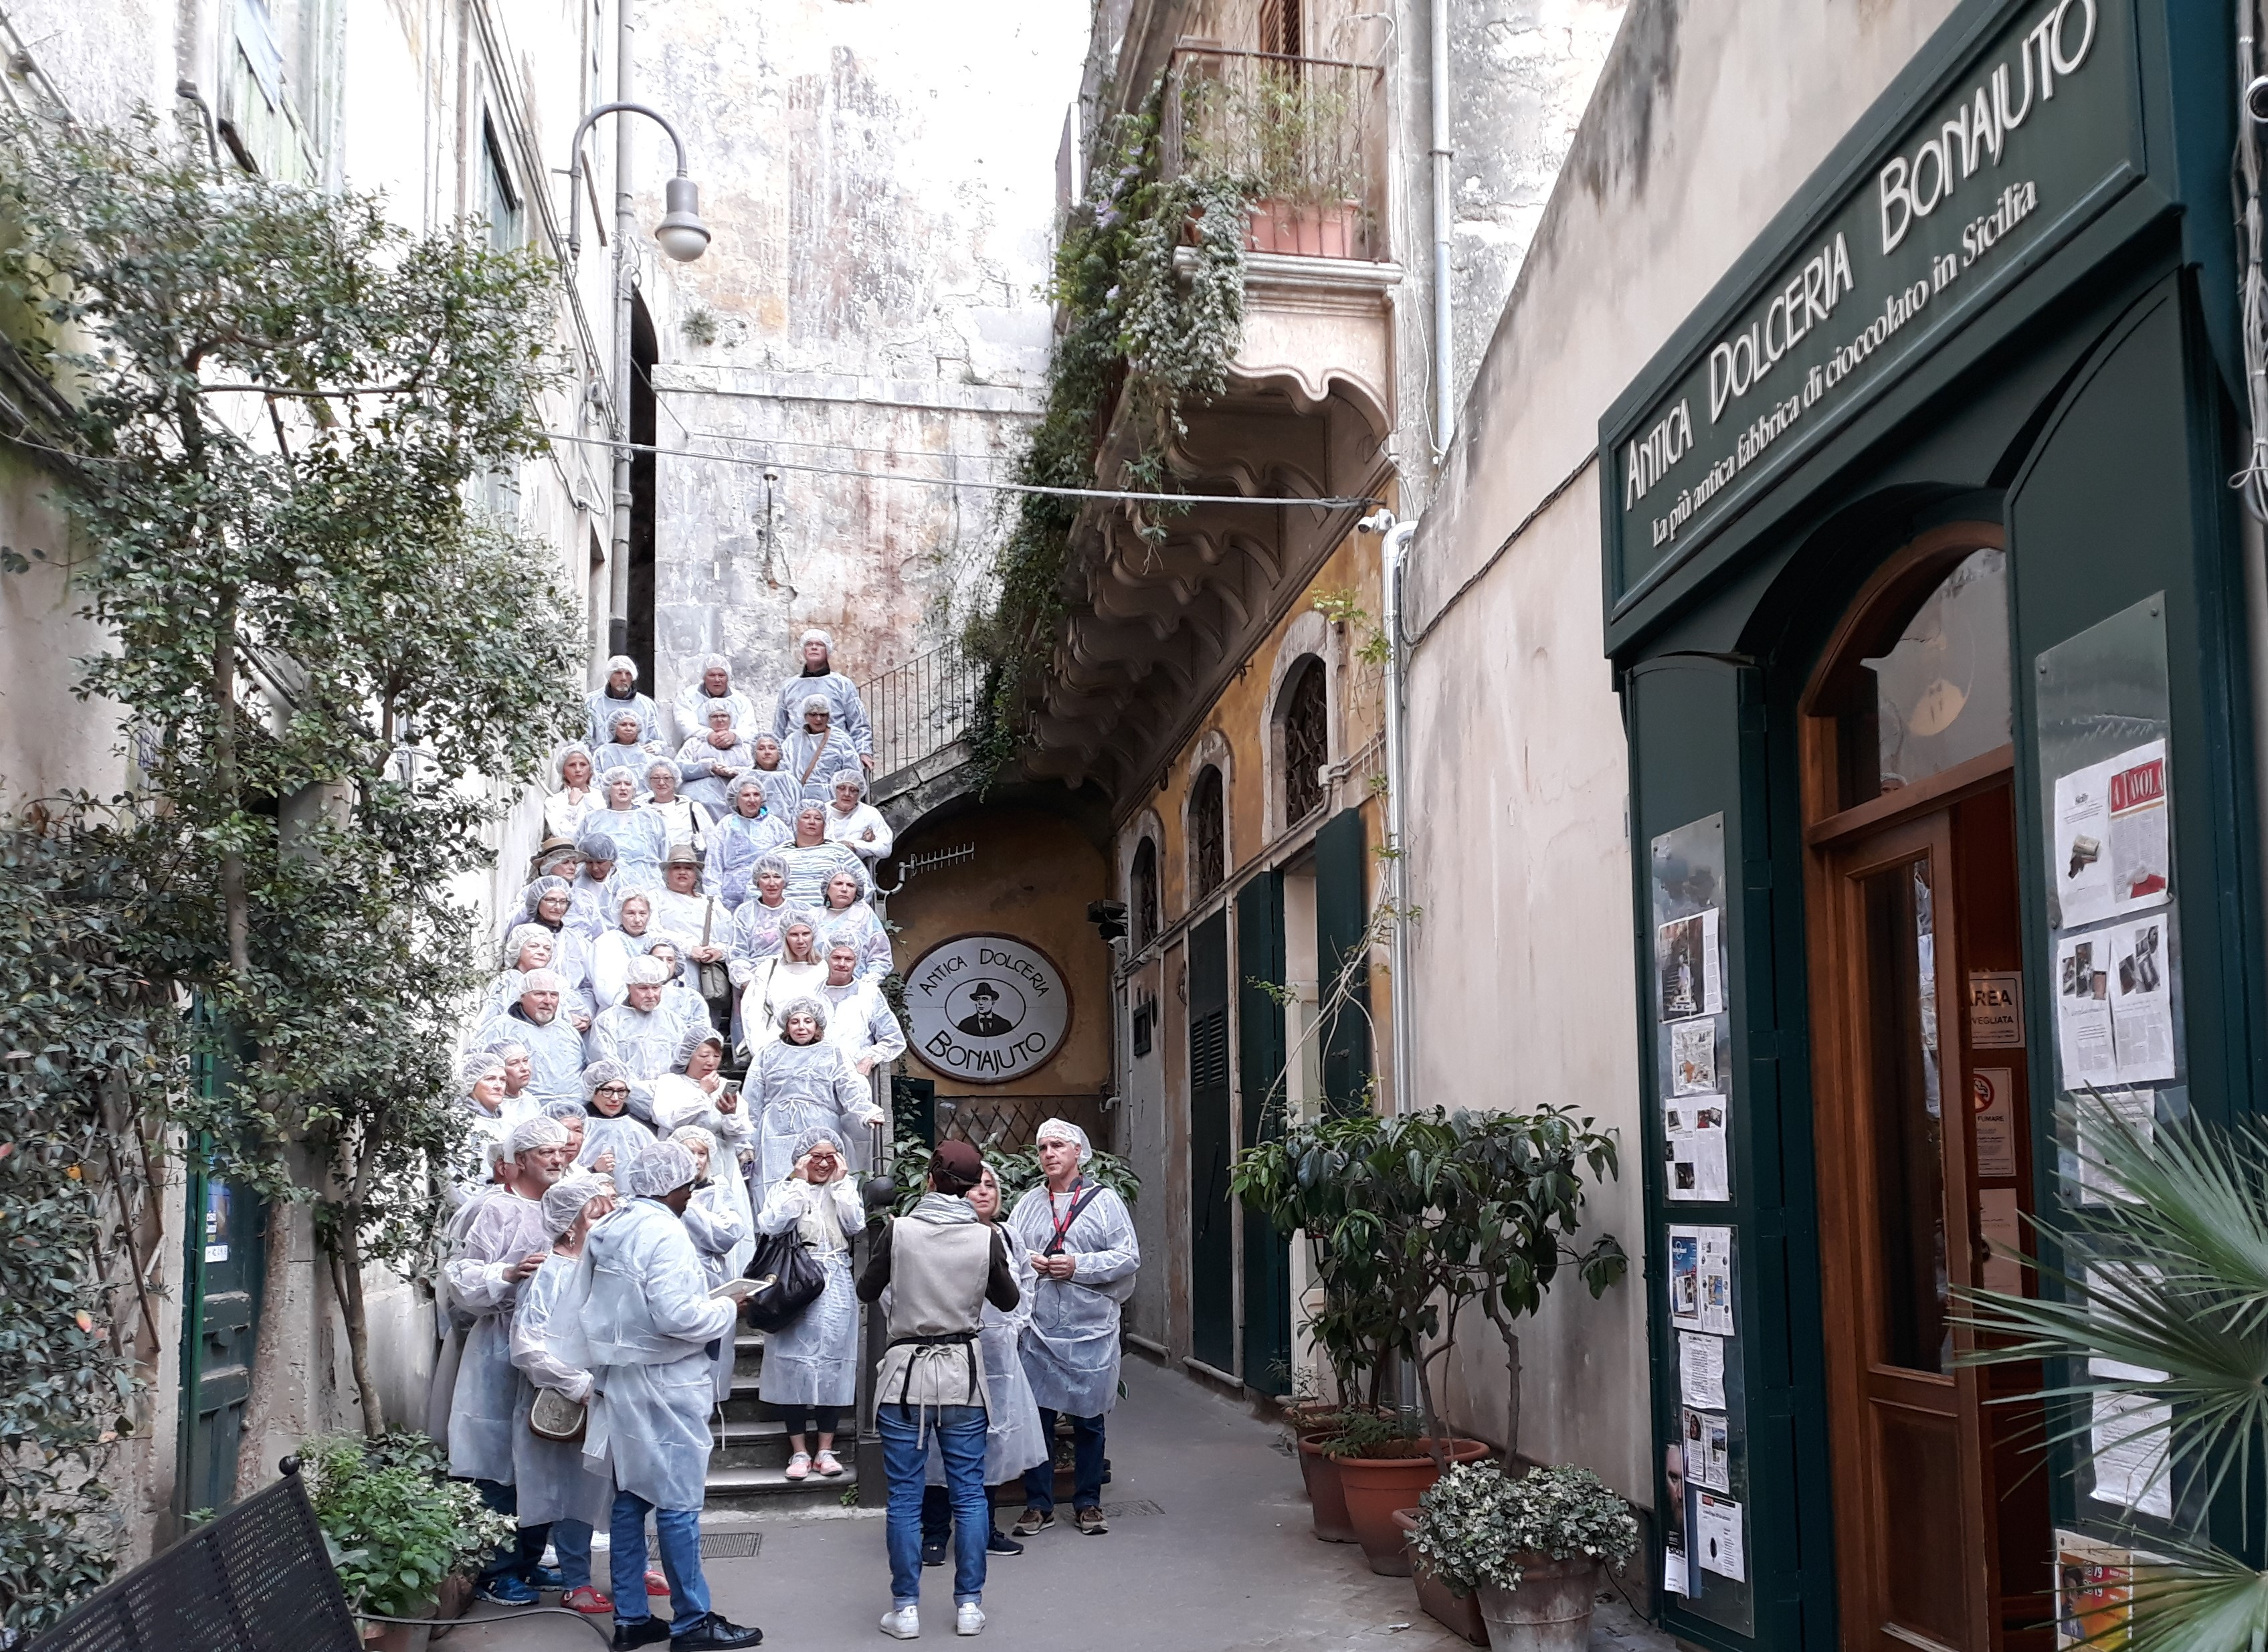 Modica, turismo esperienziale: Antica Dolceria Bonajuto all'avanguardia